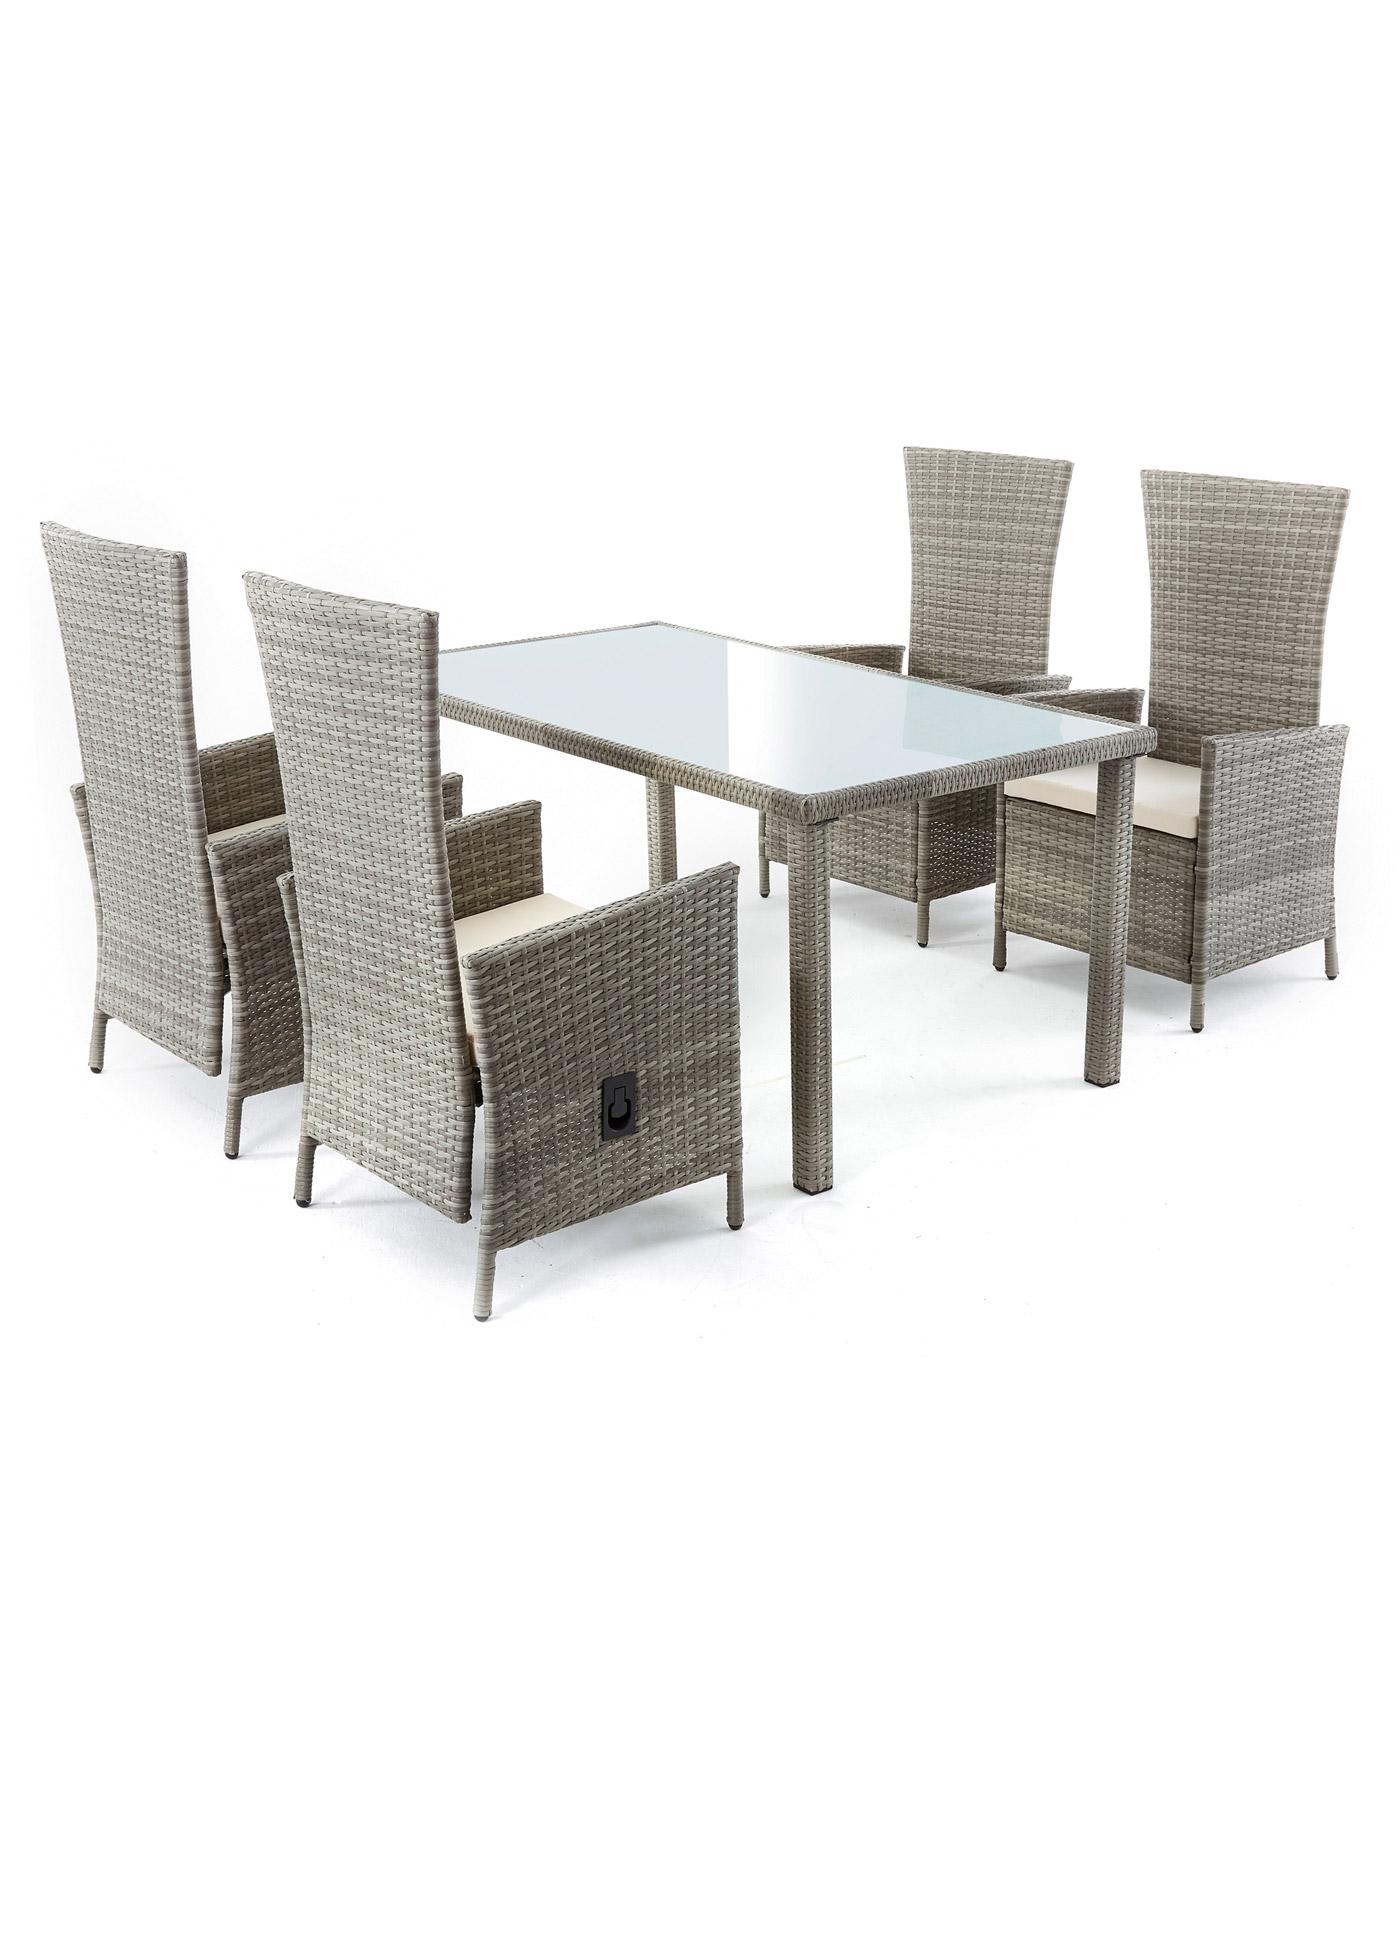 Set mobili da giardino (set 5 pezzi) (Grigio) - bpc living bonprix collection